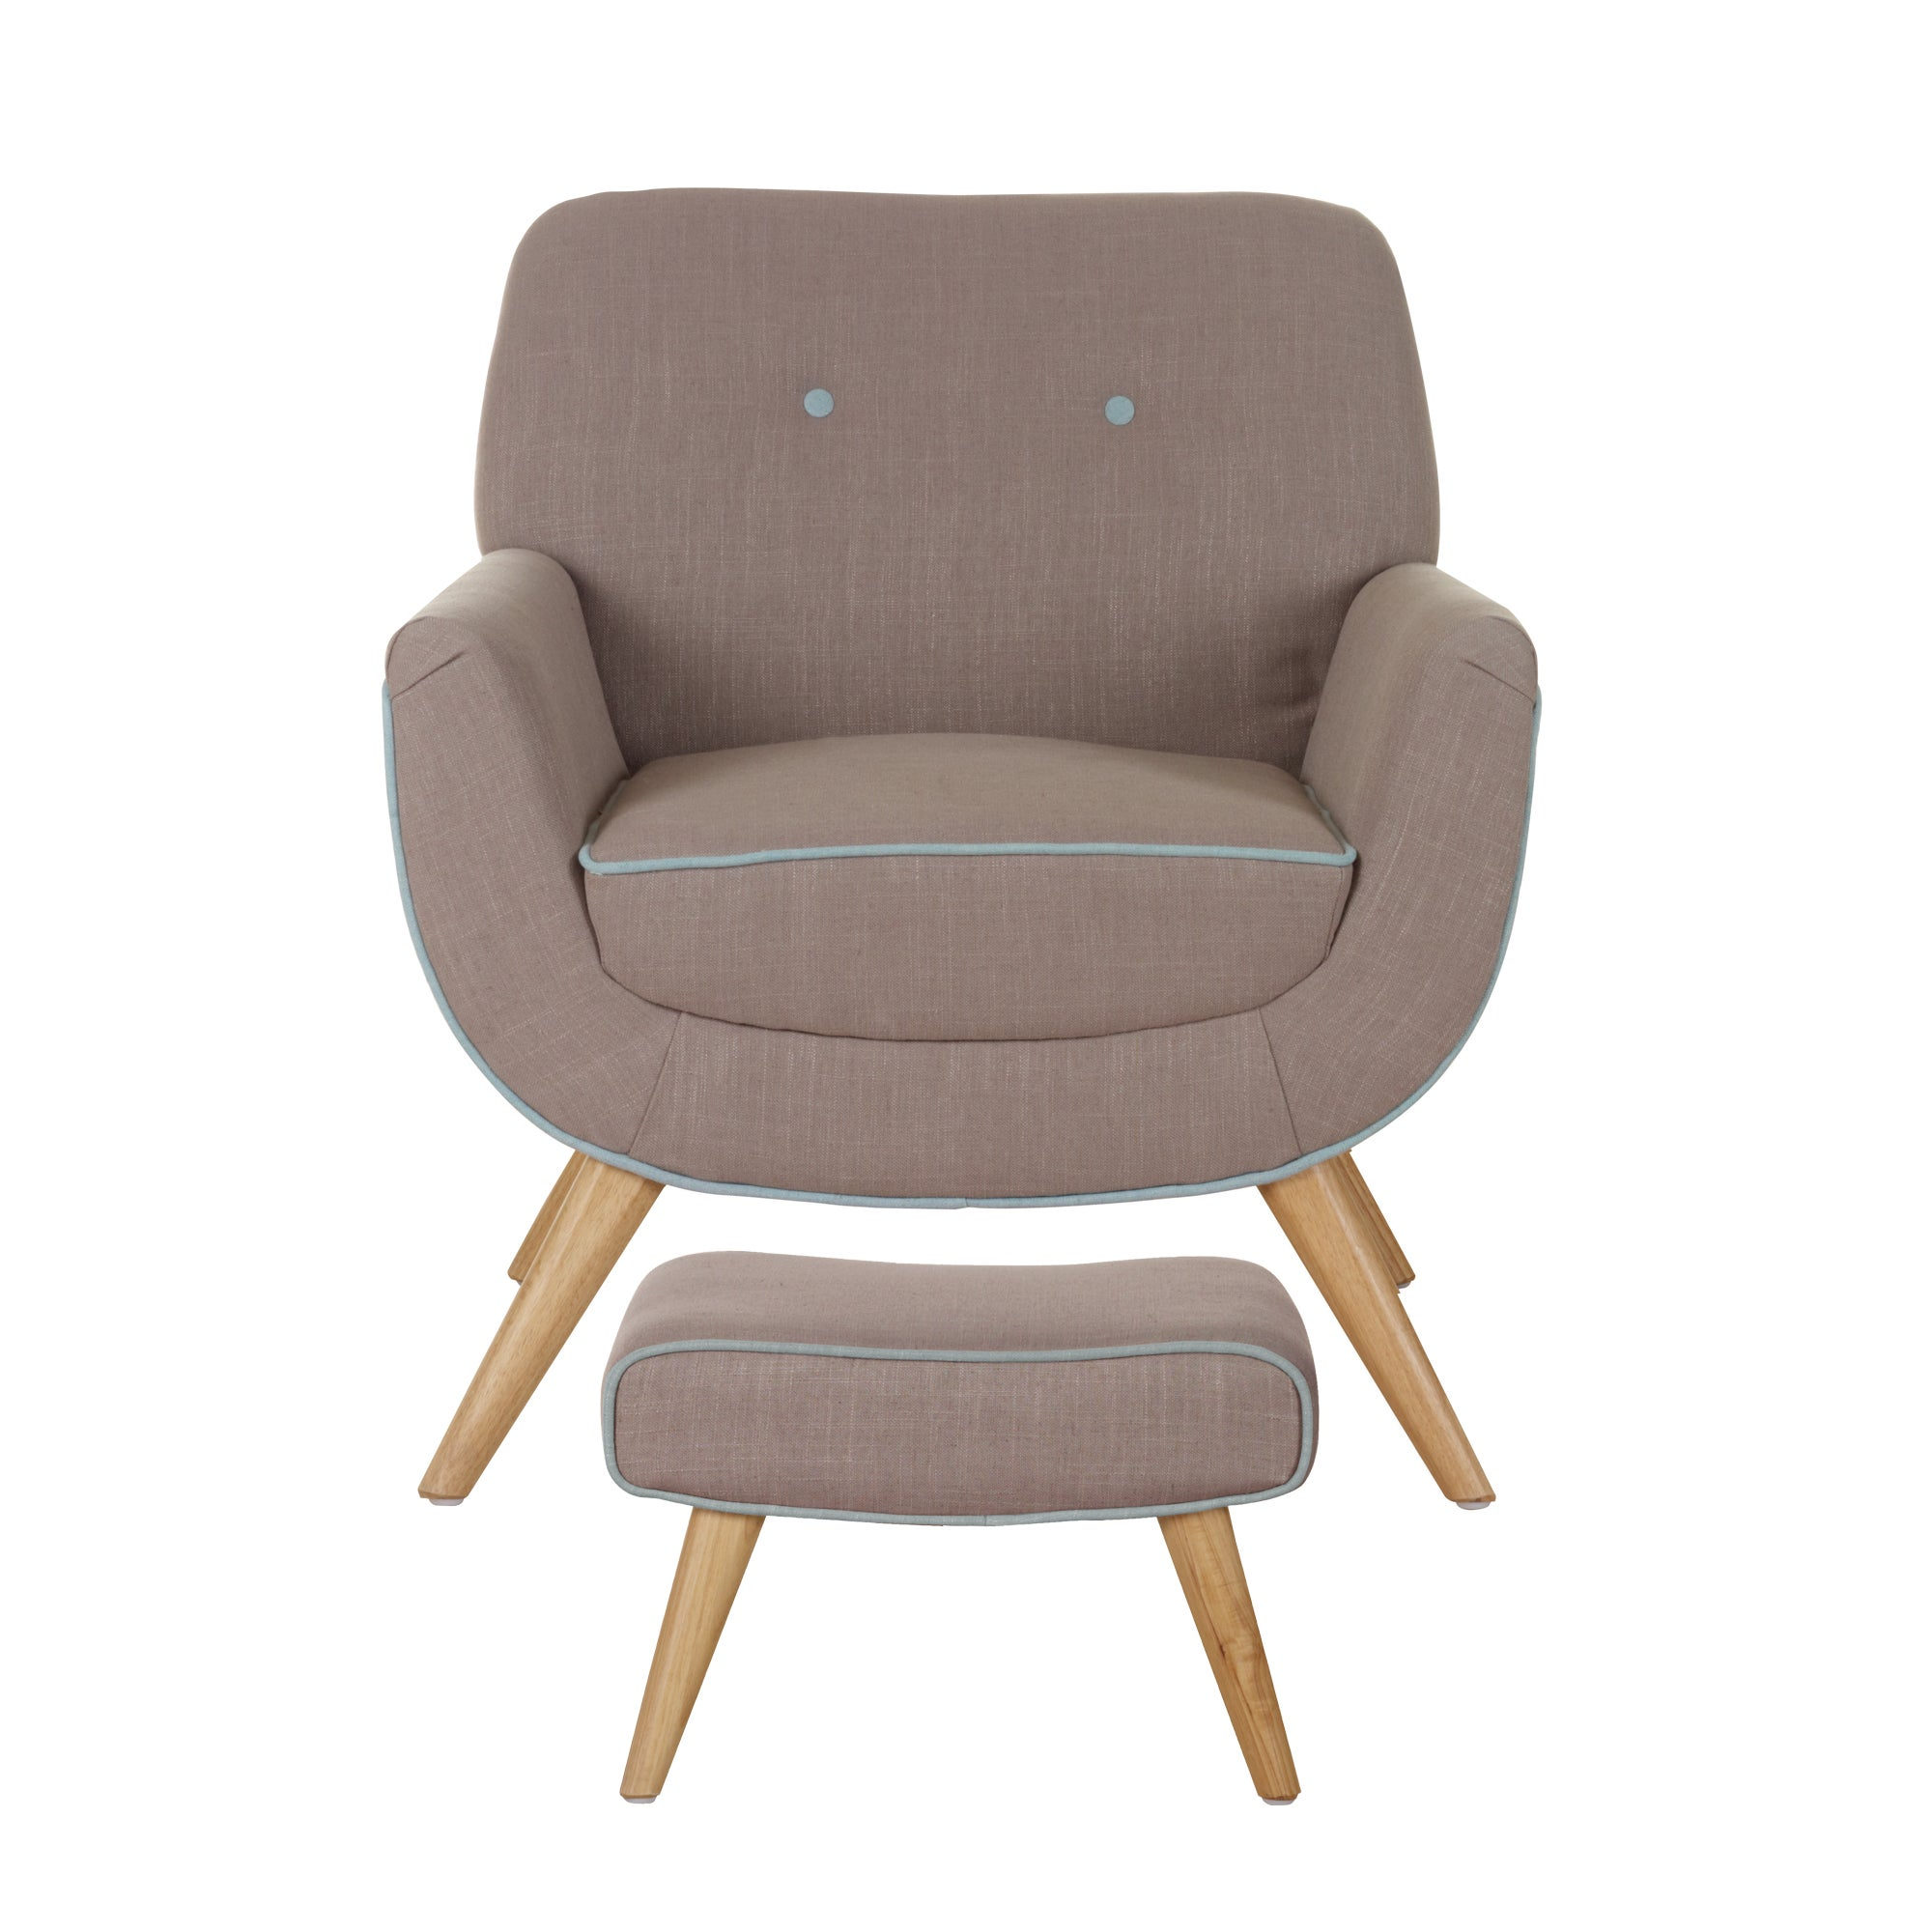 Skandi Mink Armchair and Footstool